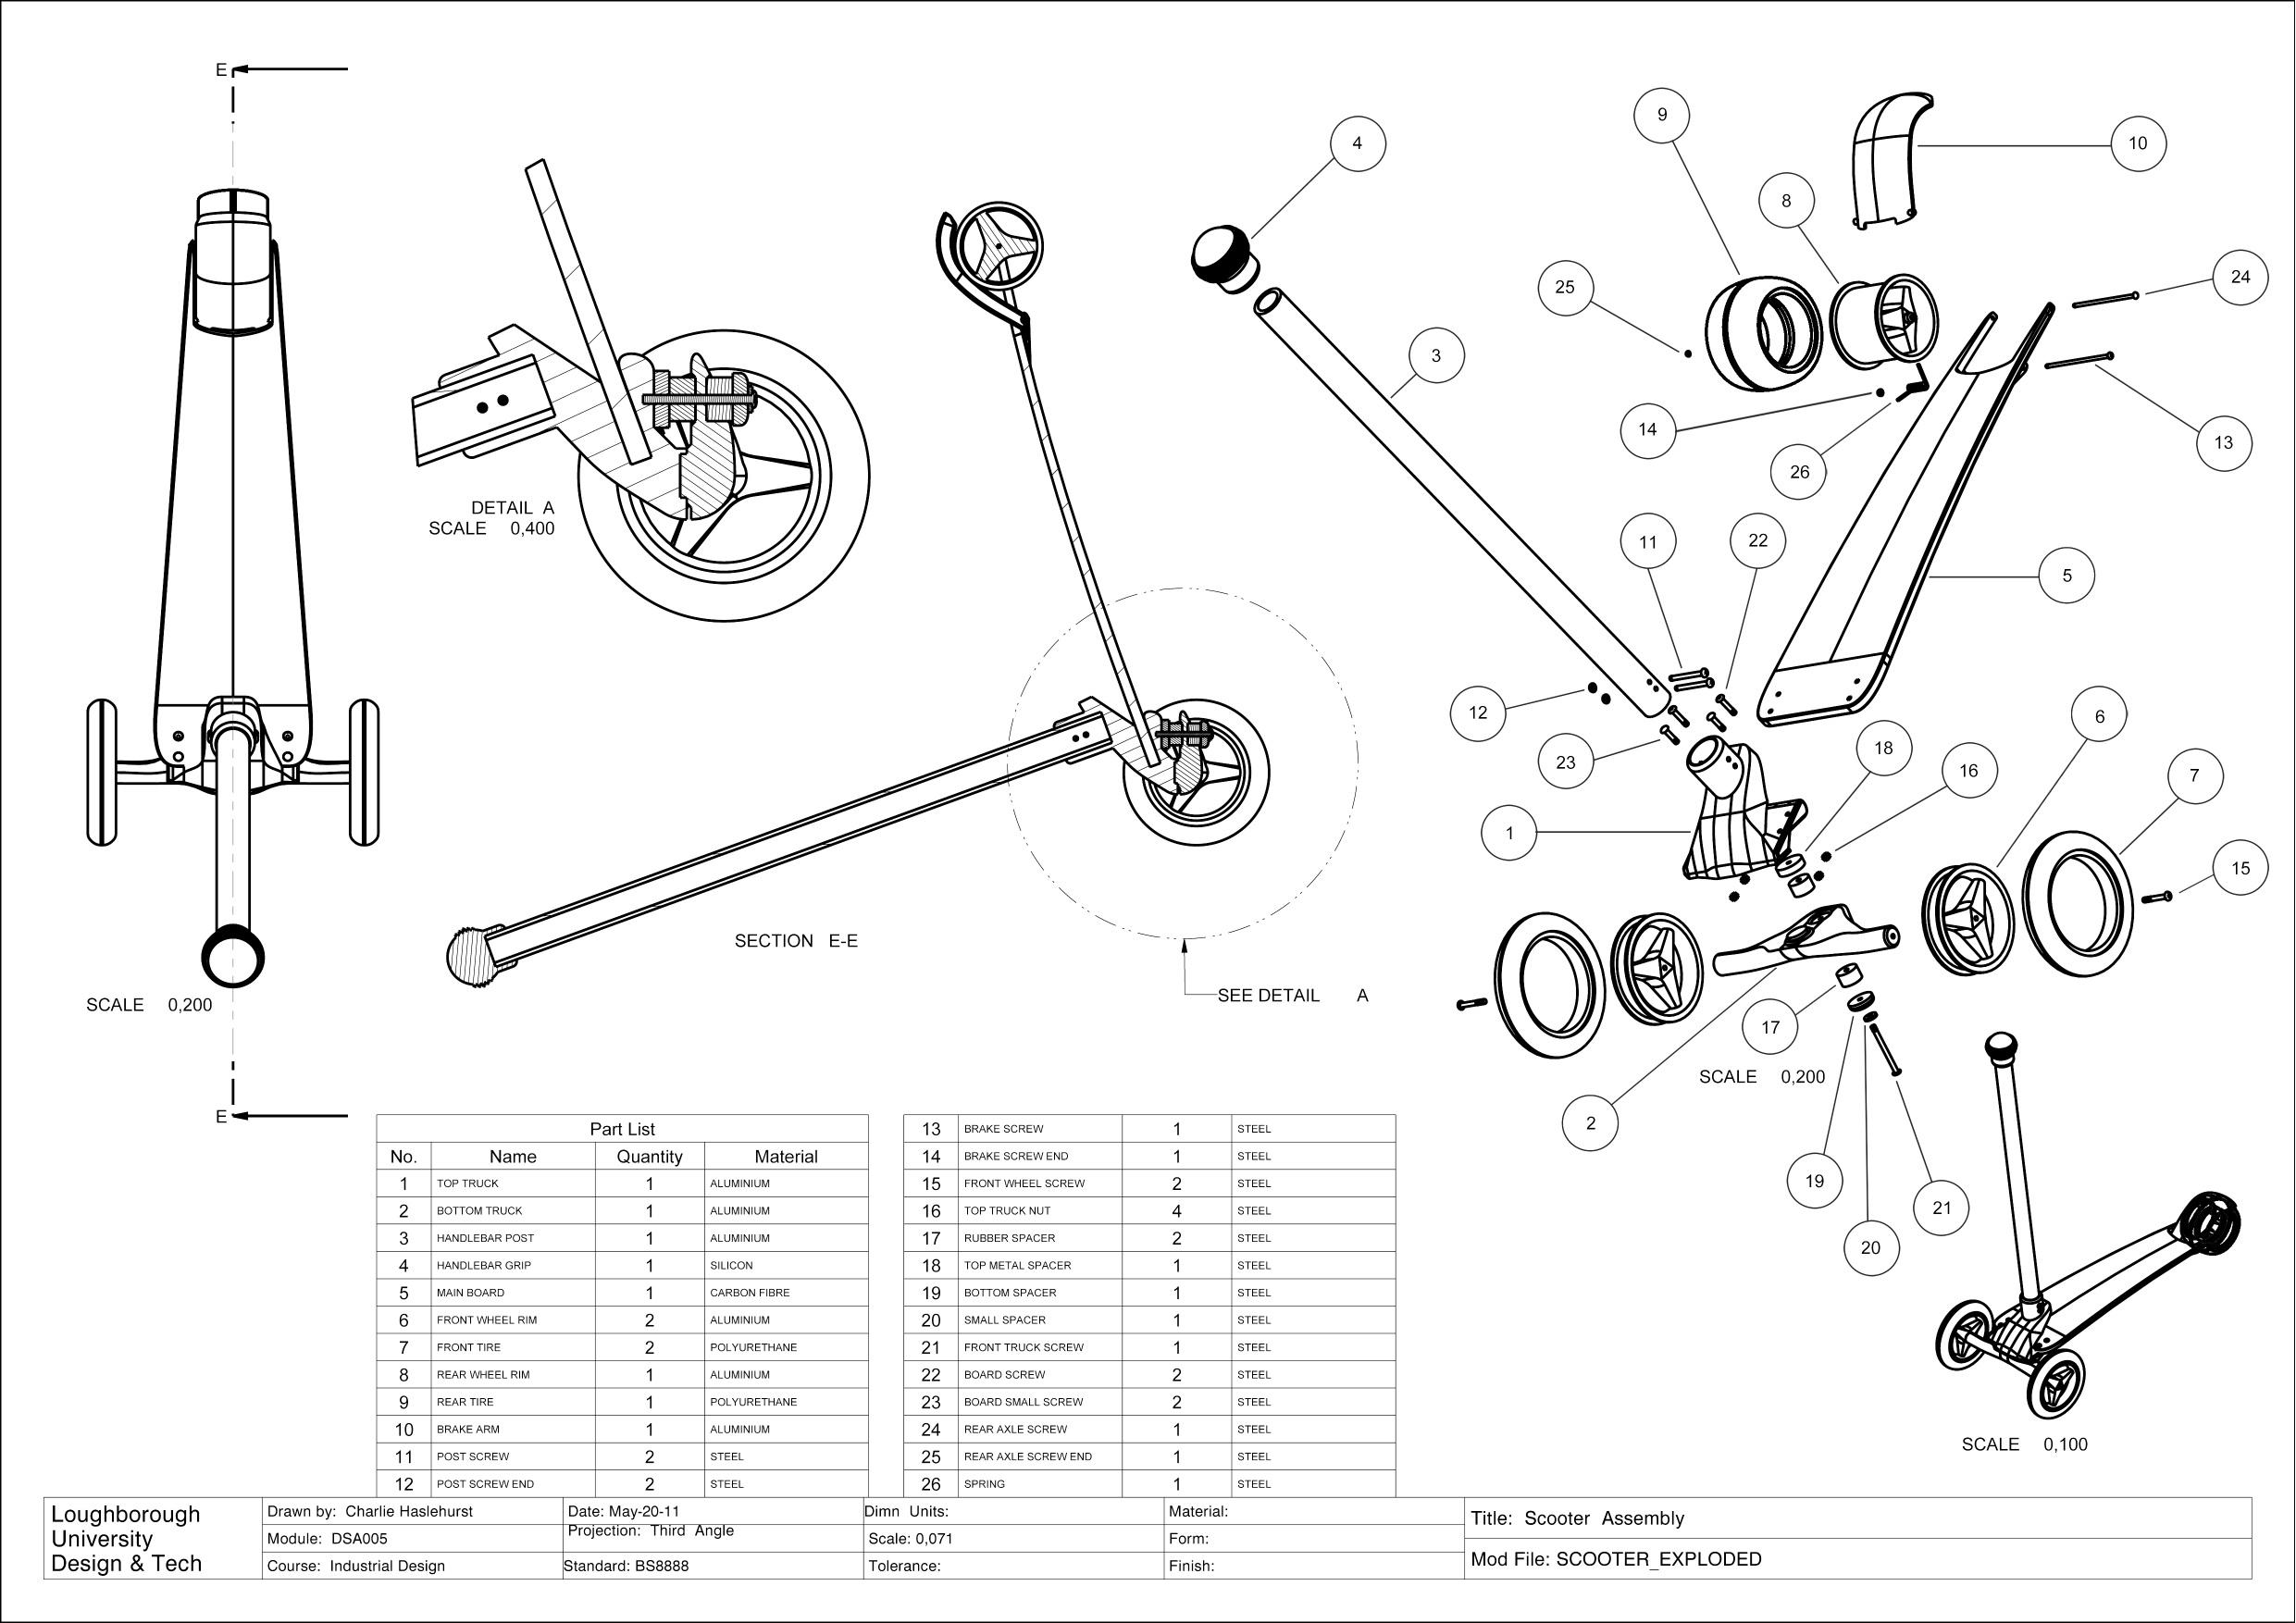 Who Makes Baja Scooters | Wiring Diagram Database on tao tao clutch diagram, 2007 yamaha baja scooter carb diagram, baja engine diagram, chinese atv engine diagram, tao tao atv parts diagram, baja suspension,